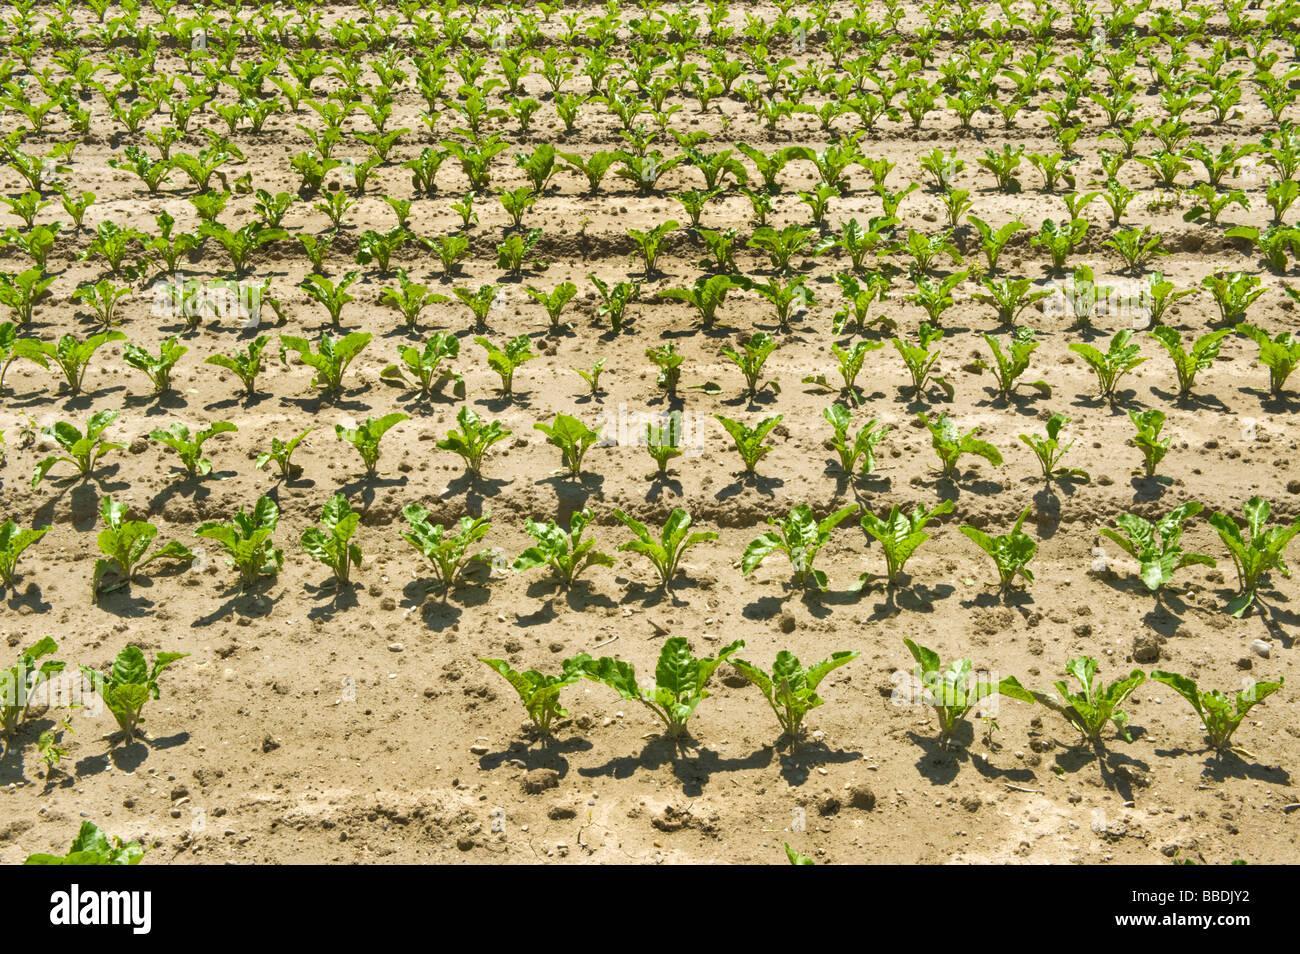 sugarbeet sugar beet row fertile prolific field crop order ordering in-line line farmer farm farming grow growing - Stock Image